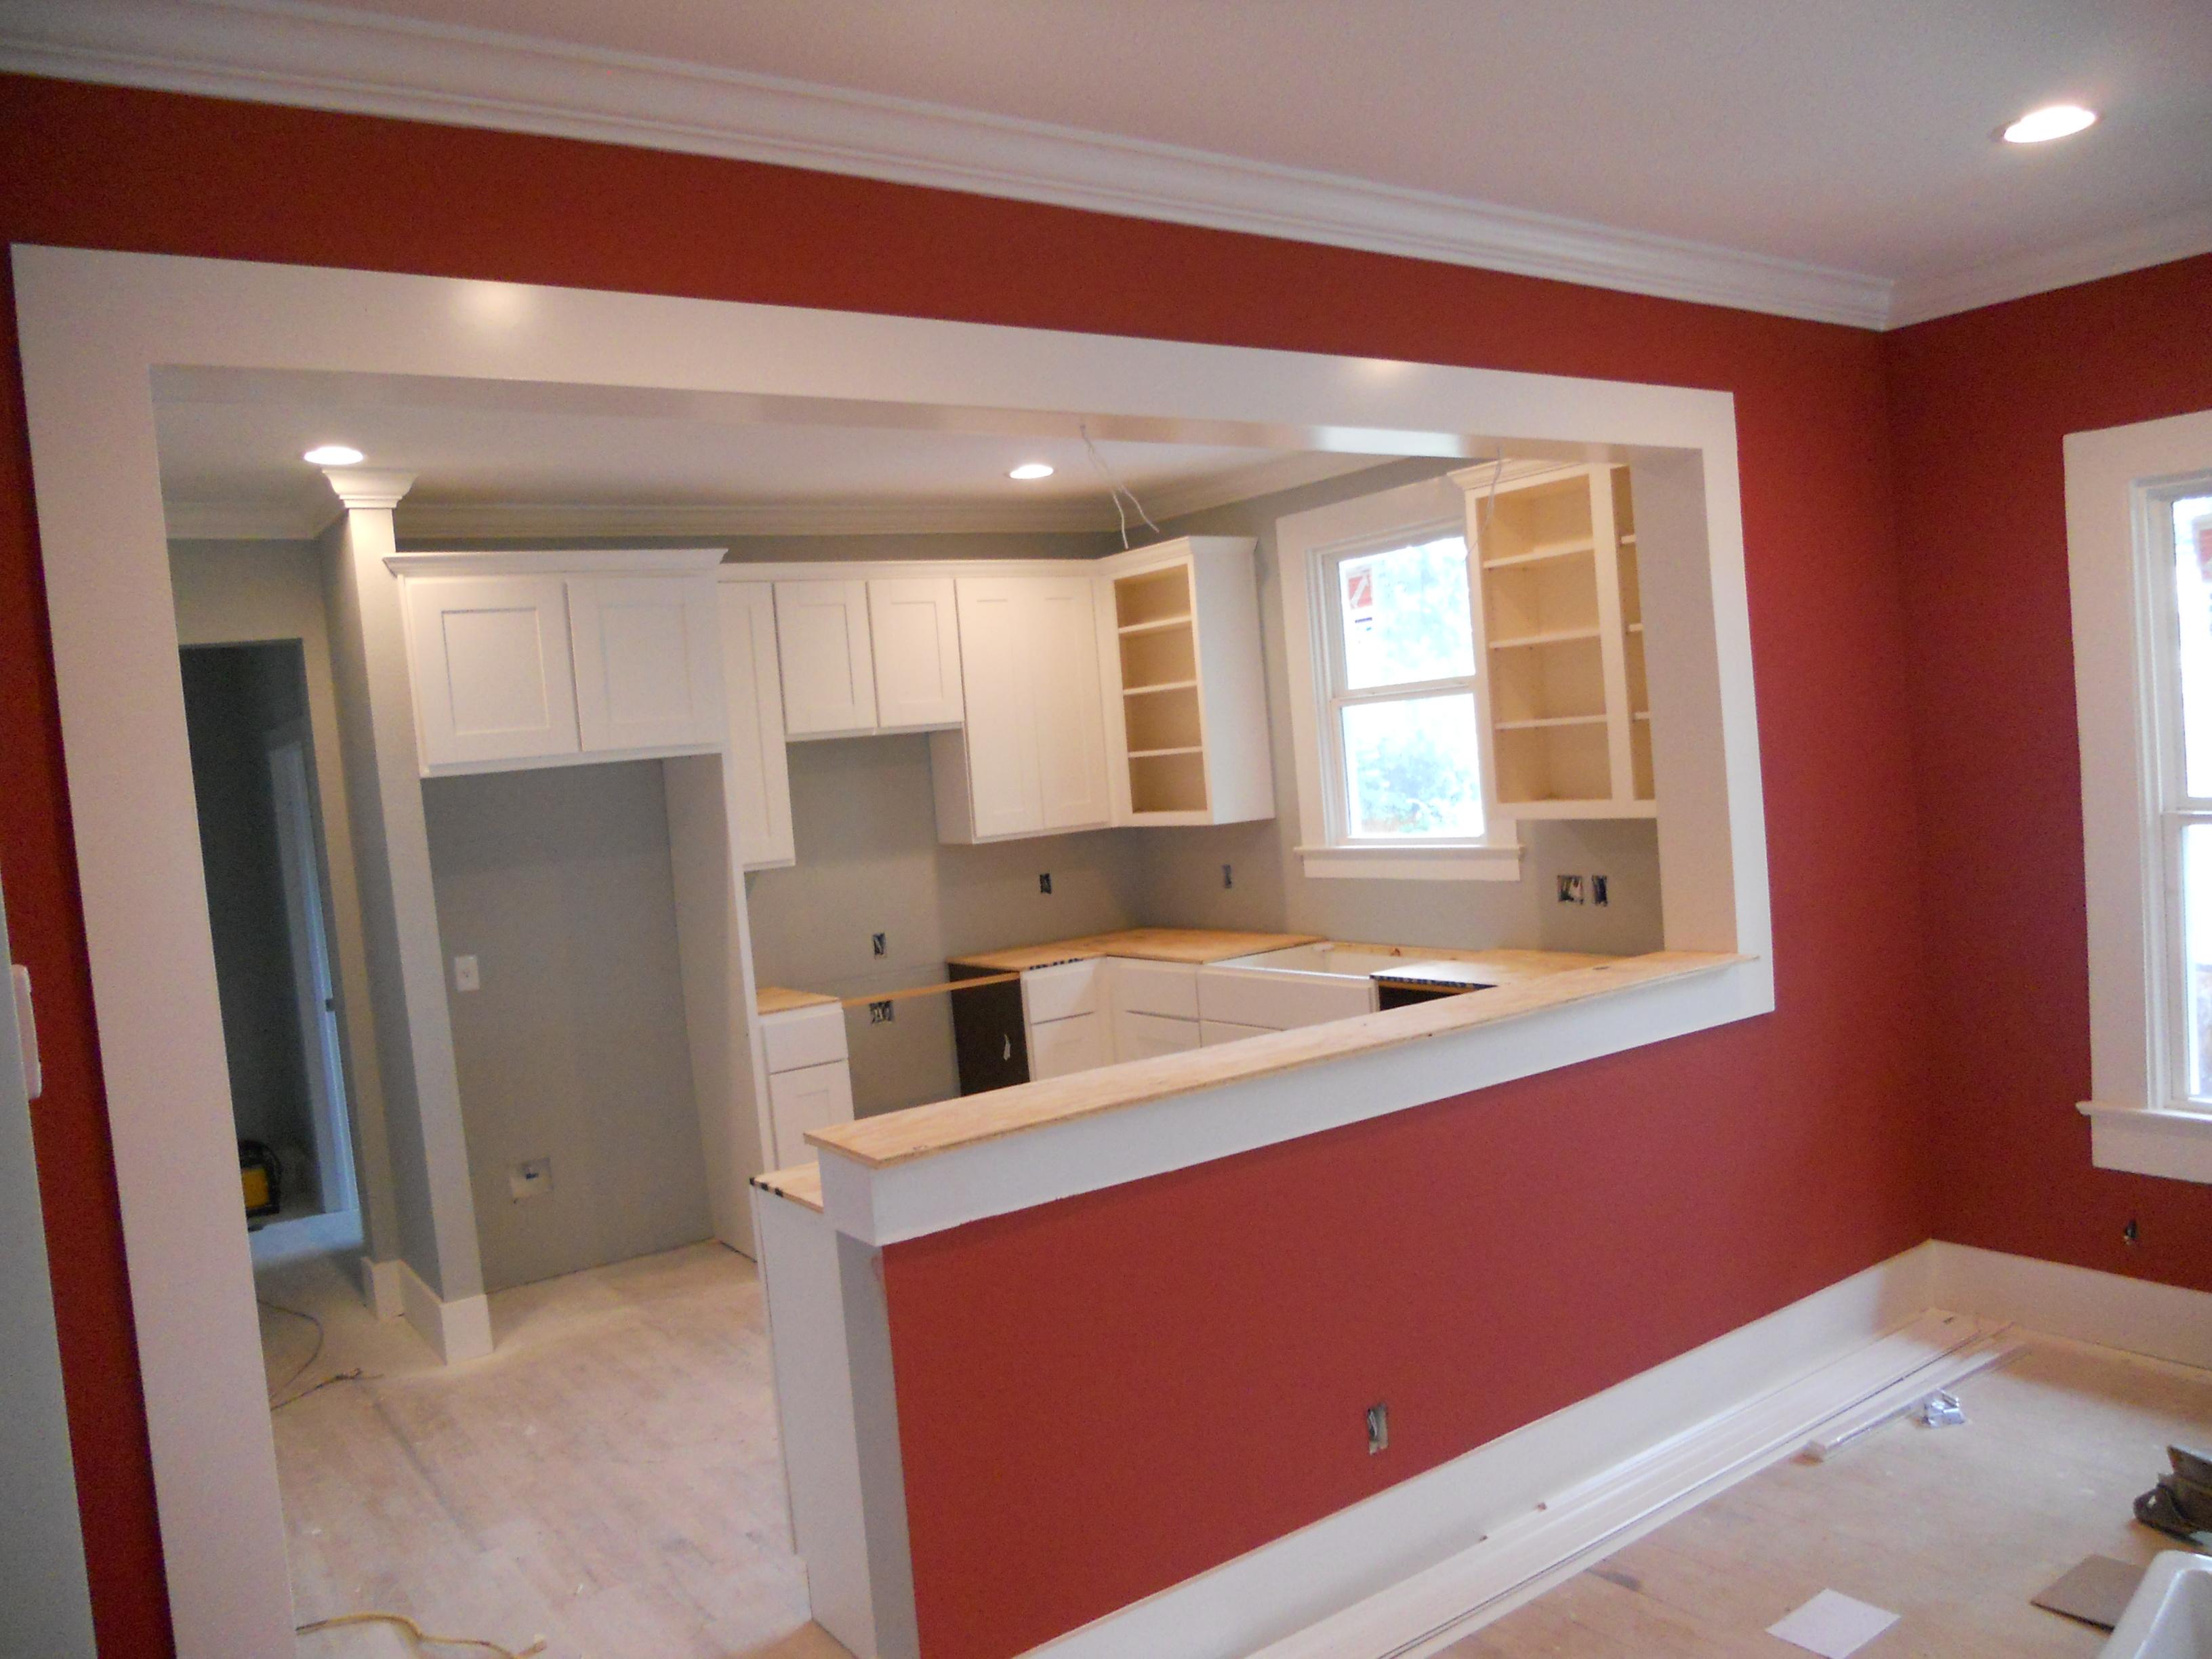 kent - Kent Kitchen Cabinets